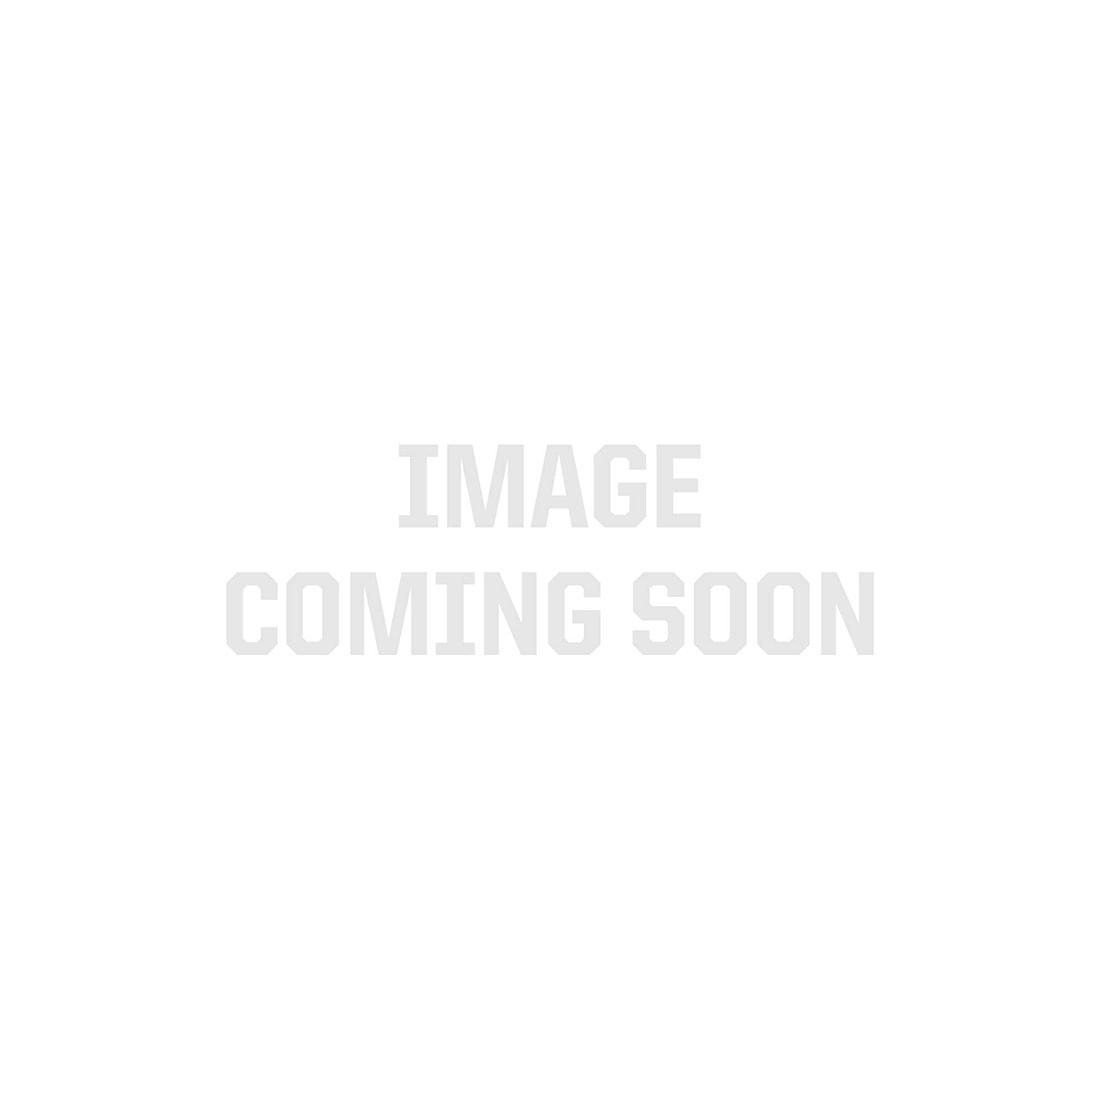 Neutral White 2835 CurrentControl Bendable ZigZag LED Strip Light, 60/m, 8mm wide, Sample Kit